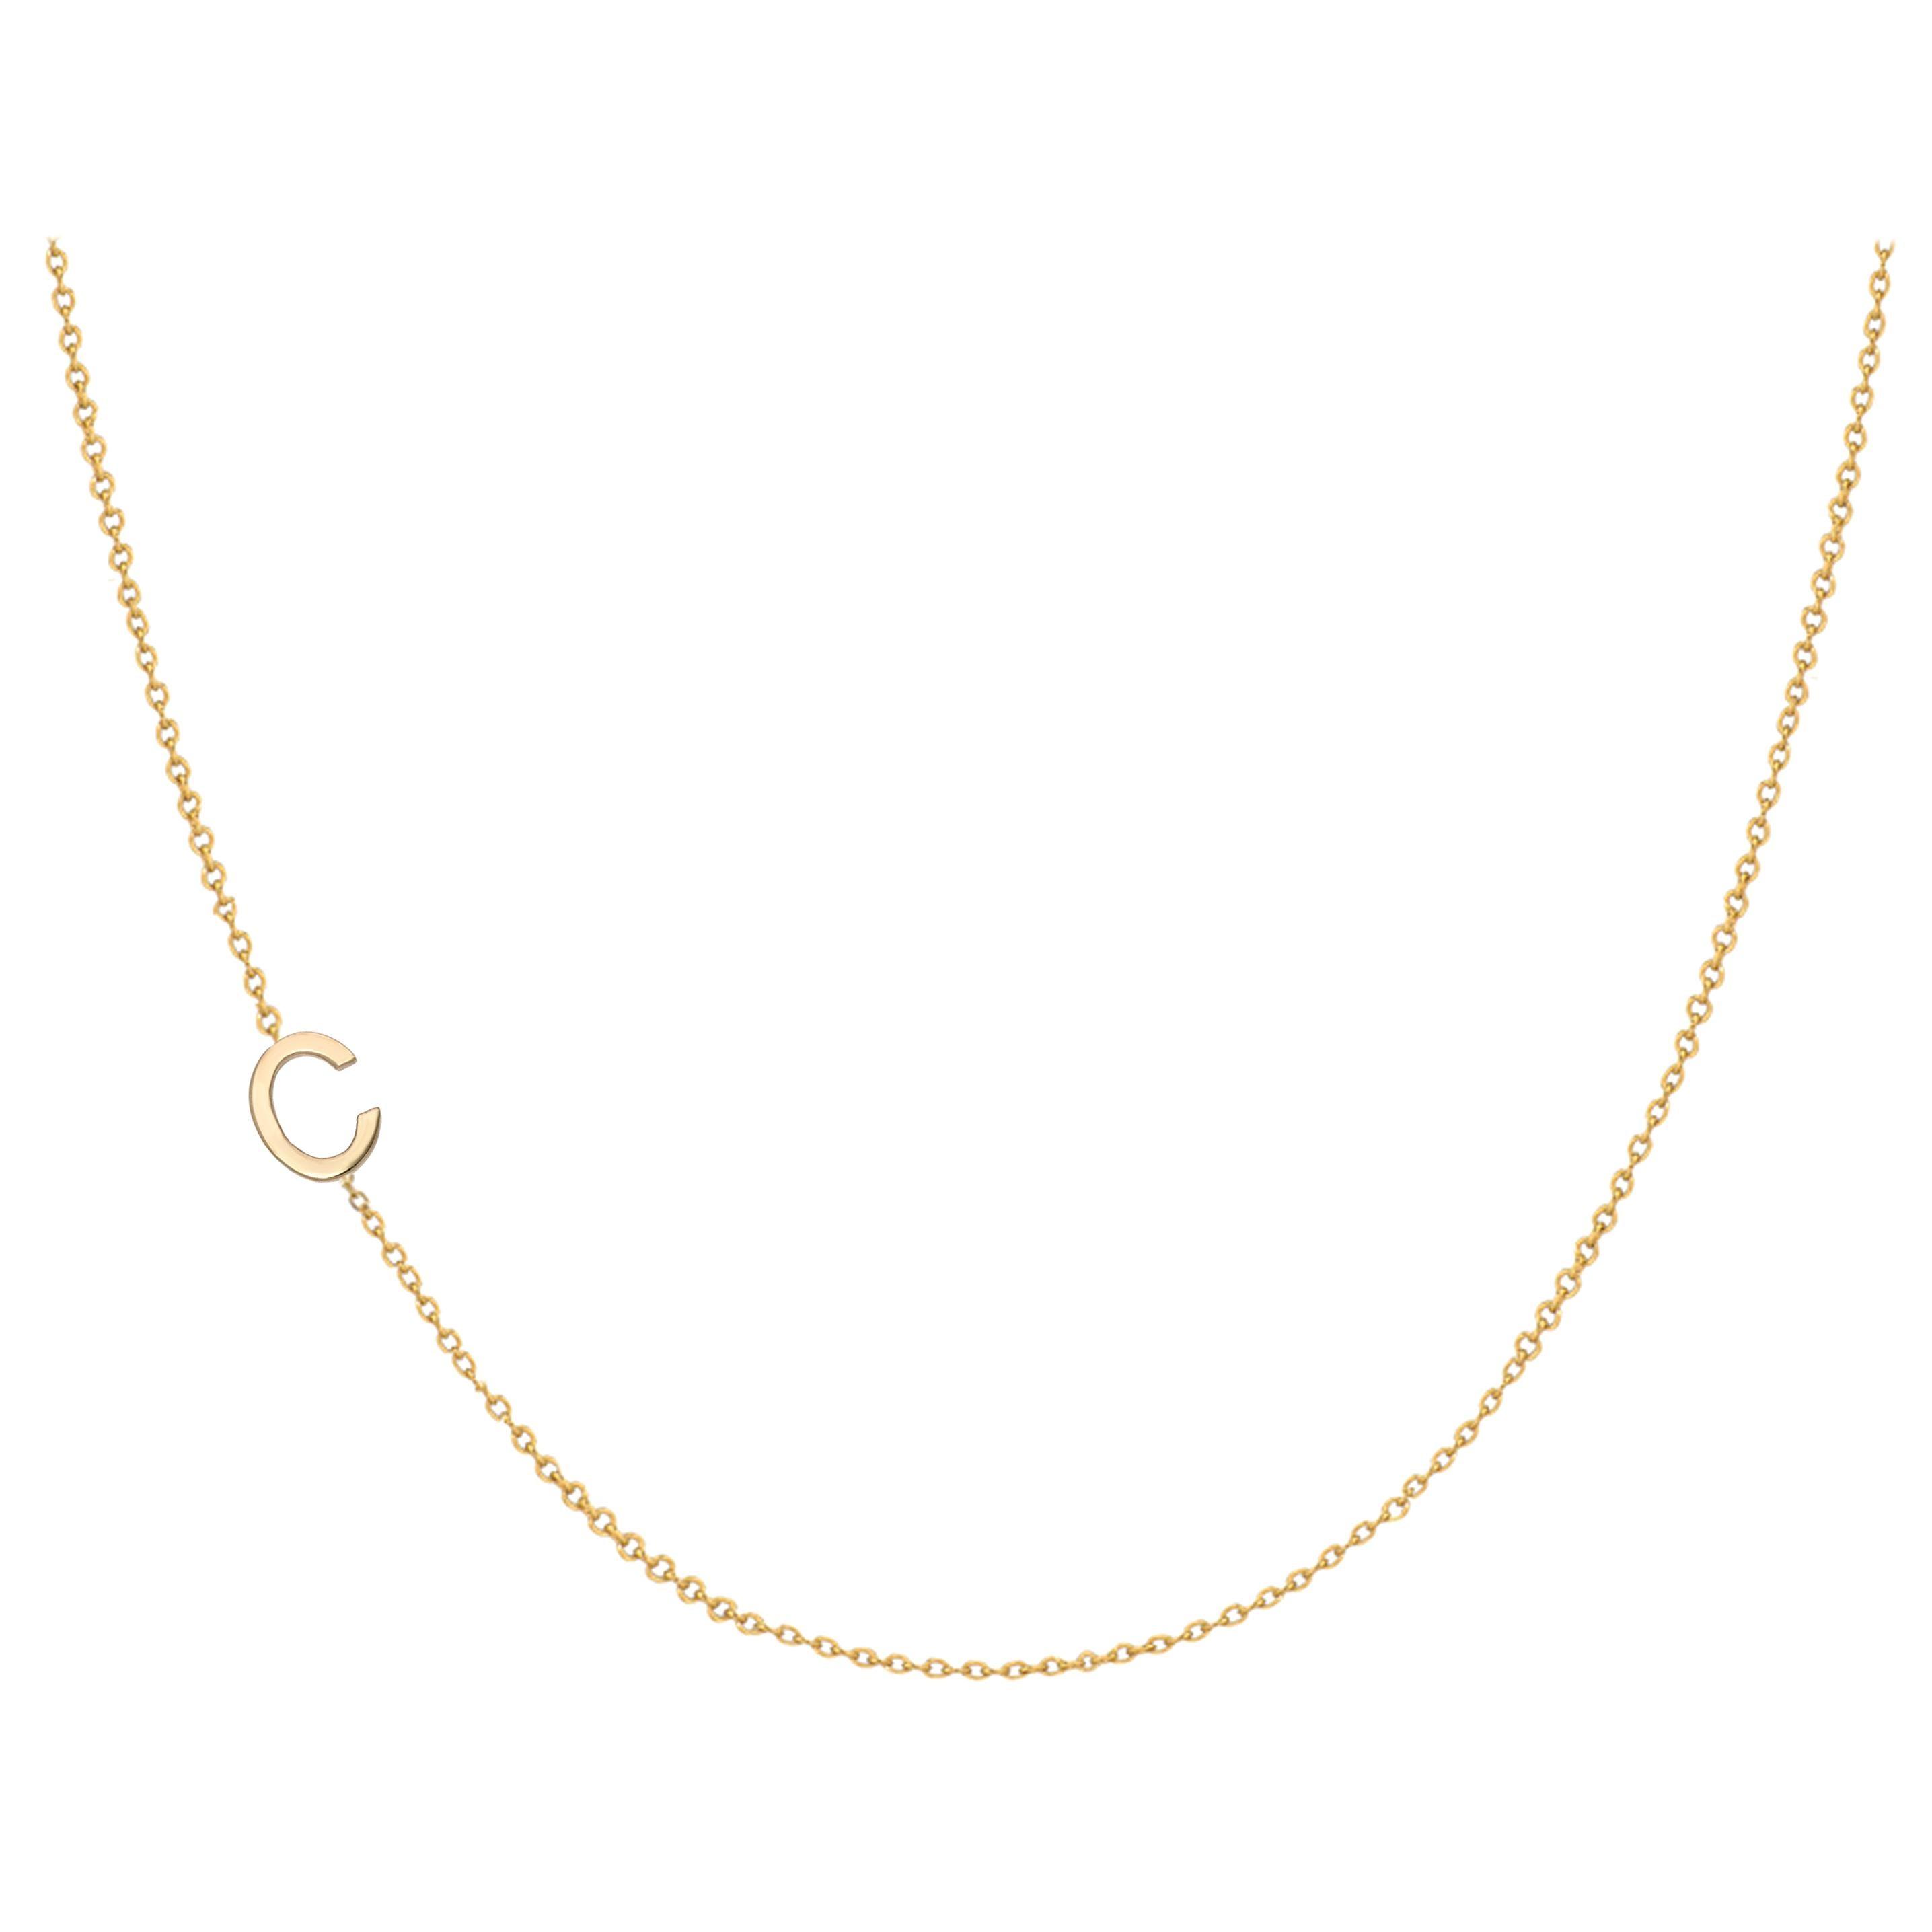 14 Karat Gold Asymmetrical Initial Necklace, C